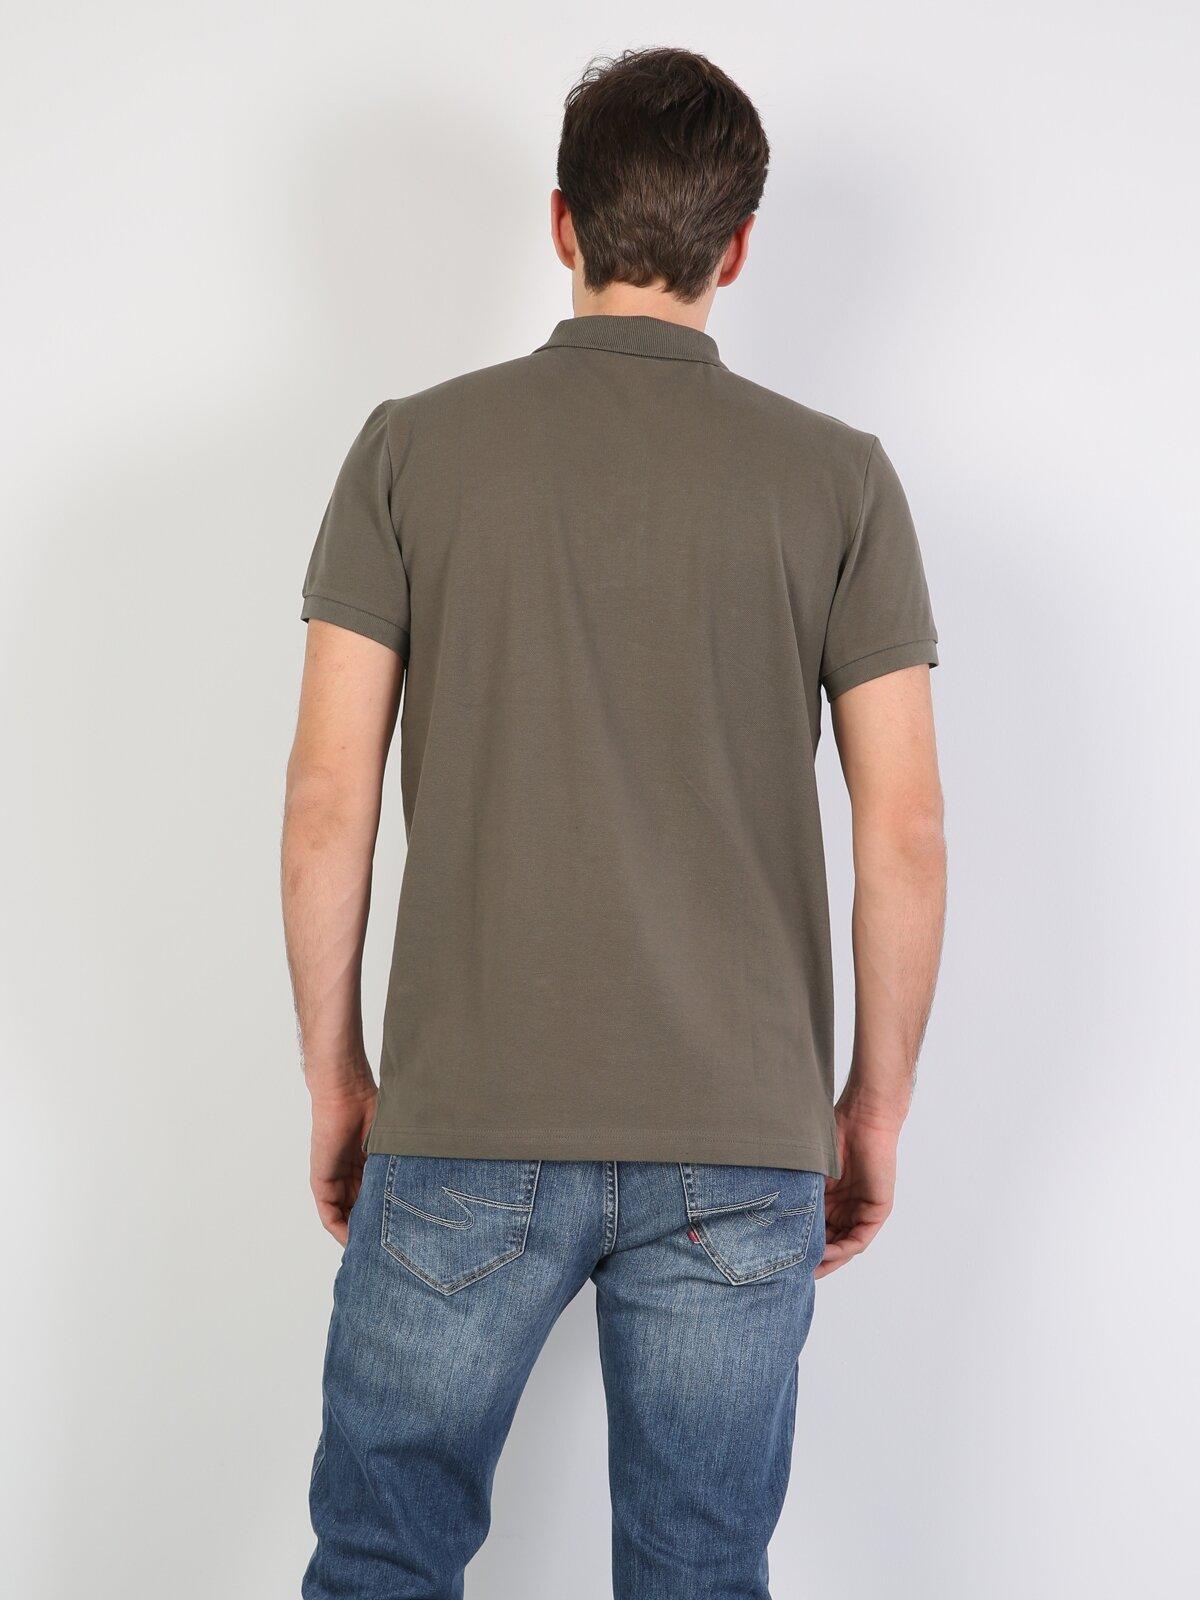 Polo Yaka Haki Kısa Kol Tişört